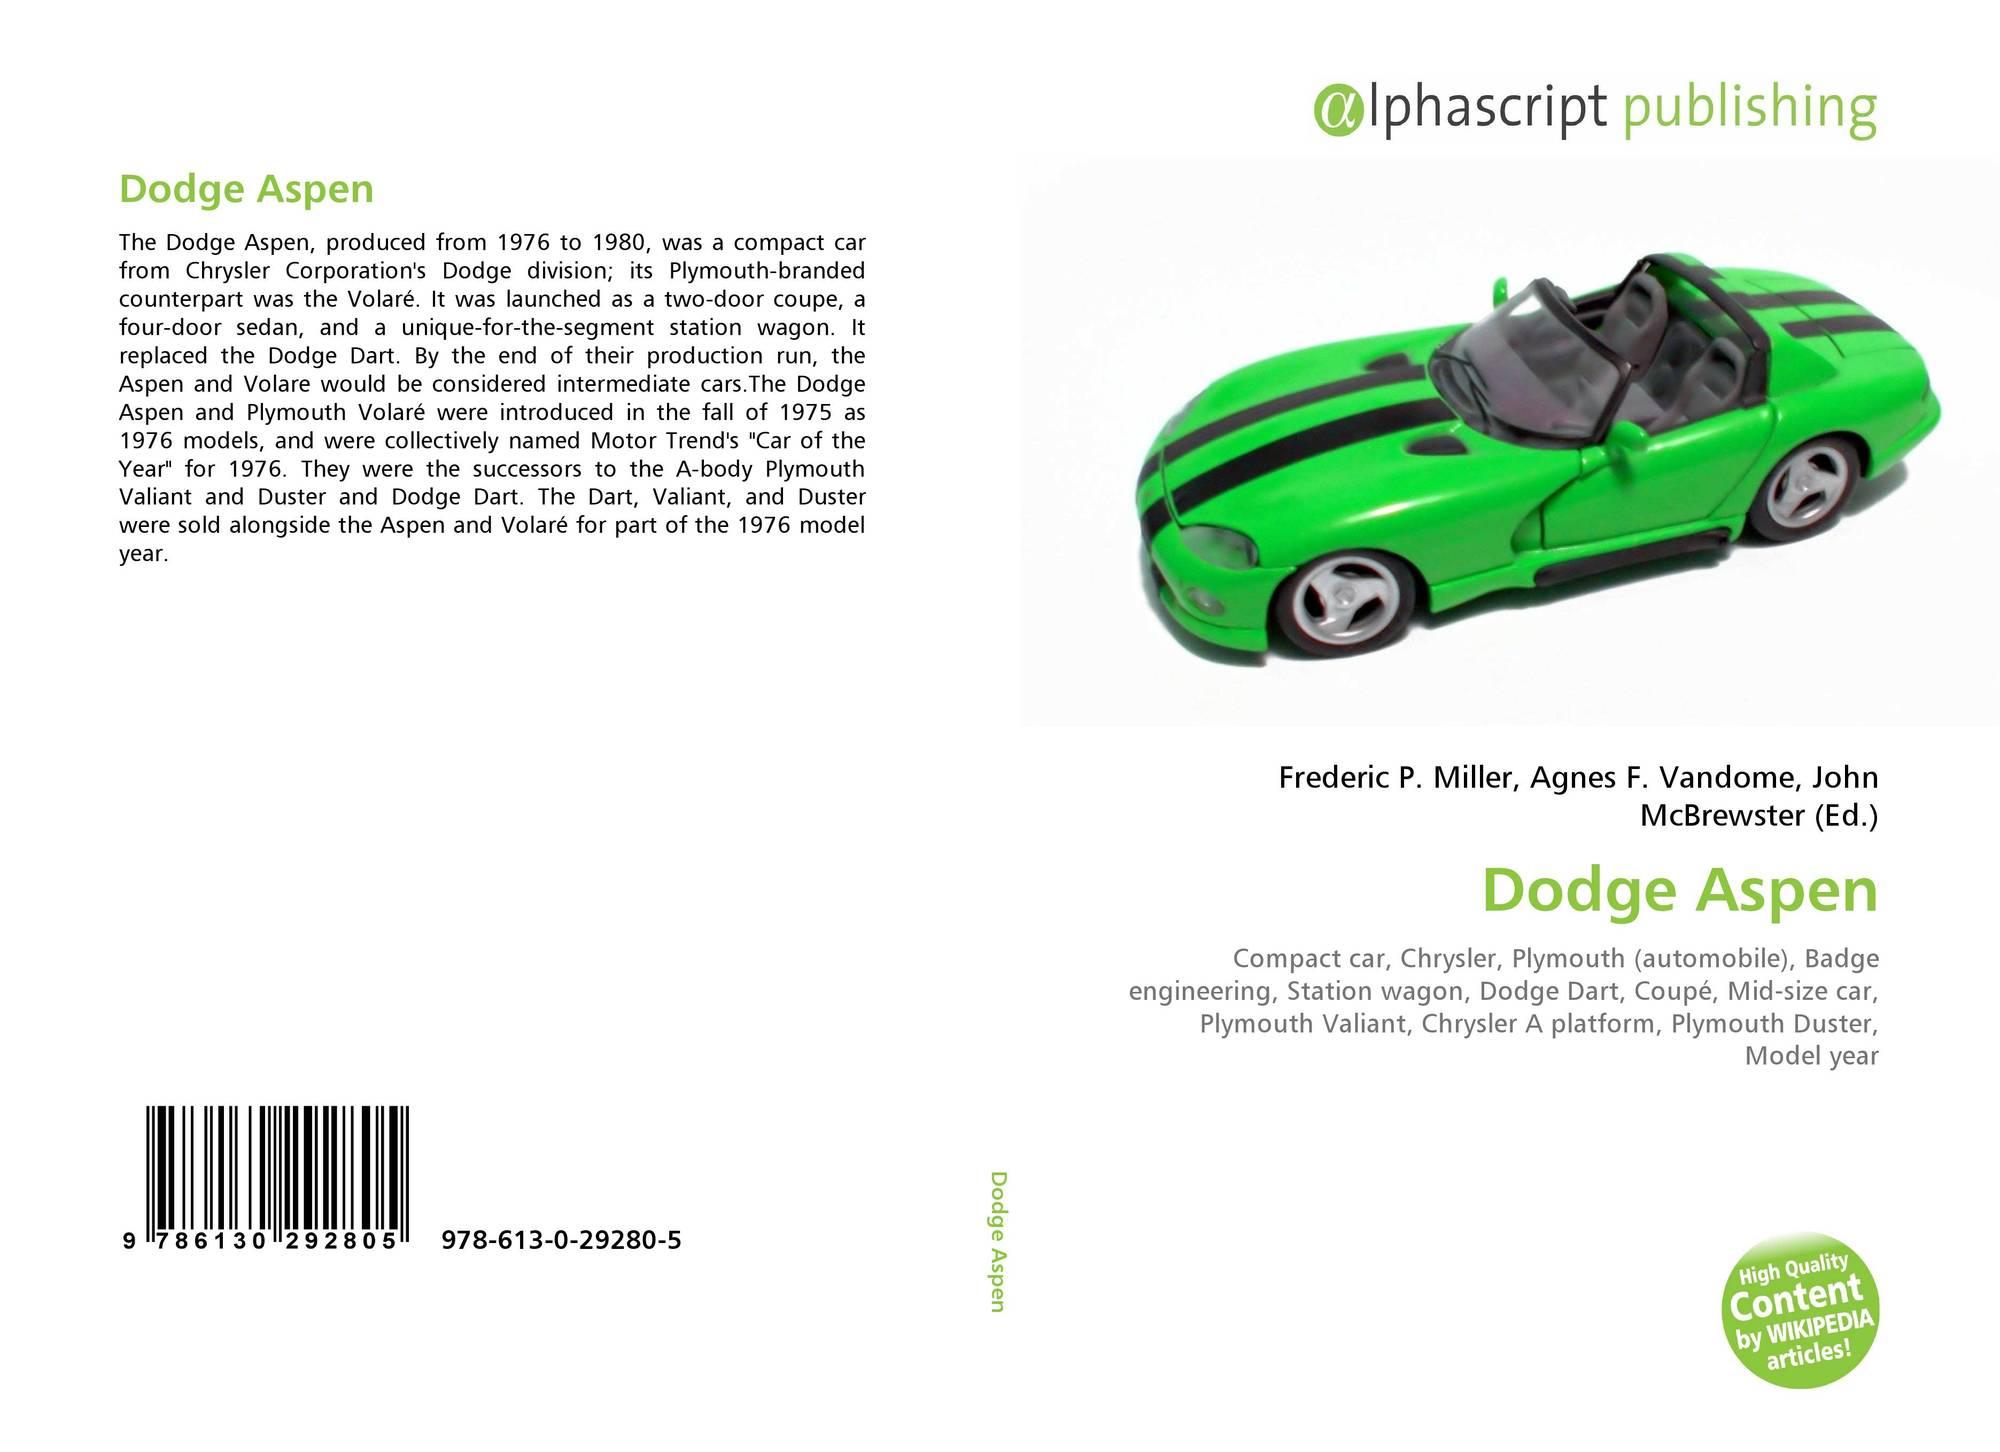 Dodge Aspen Wiki